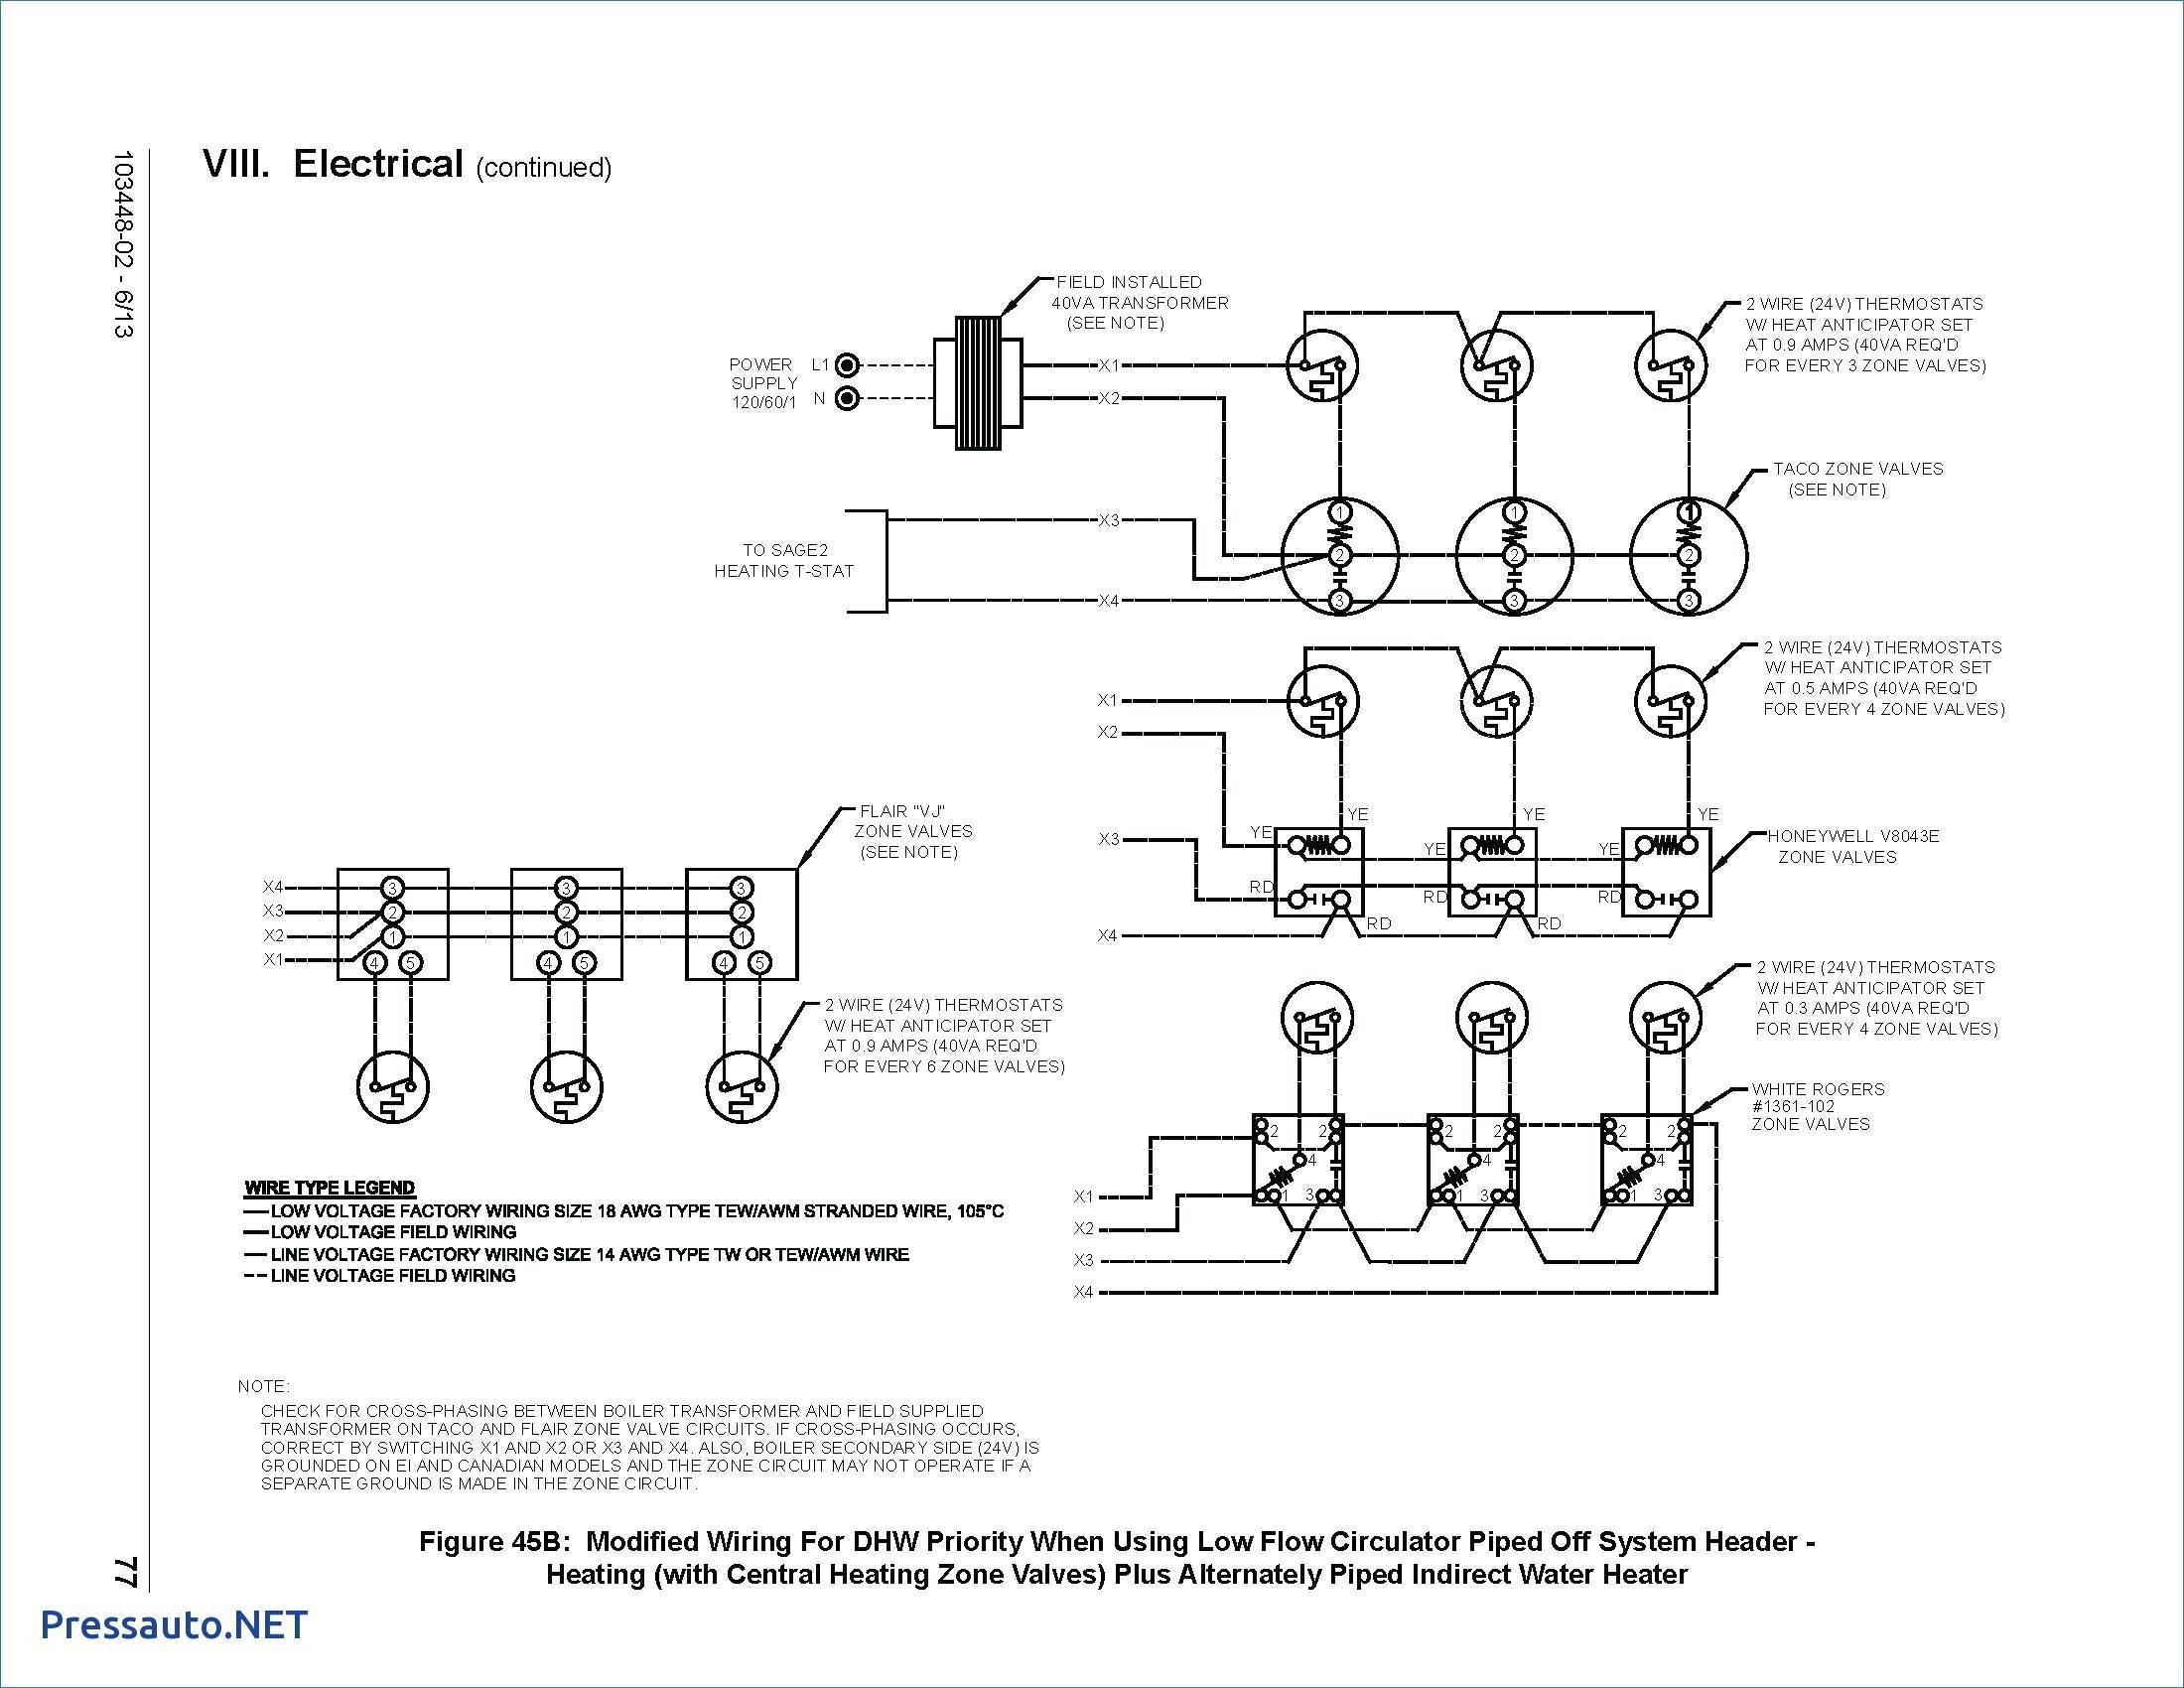 taco 006 b4 wiring diagram Download-Taco Circulator Pump Wiring Diagram Unique Zone Valve Wiring Diagram Taco 006 B4 Wiring Diagram 16-o